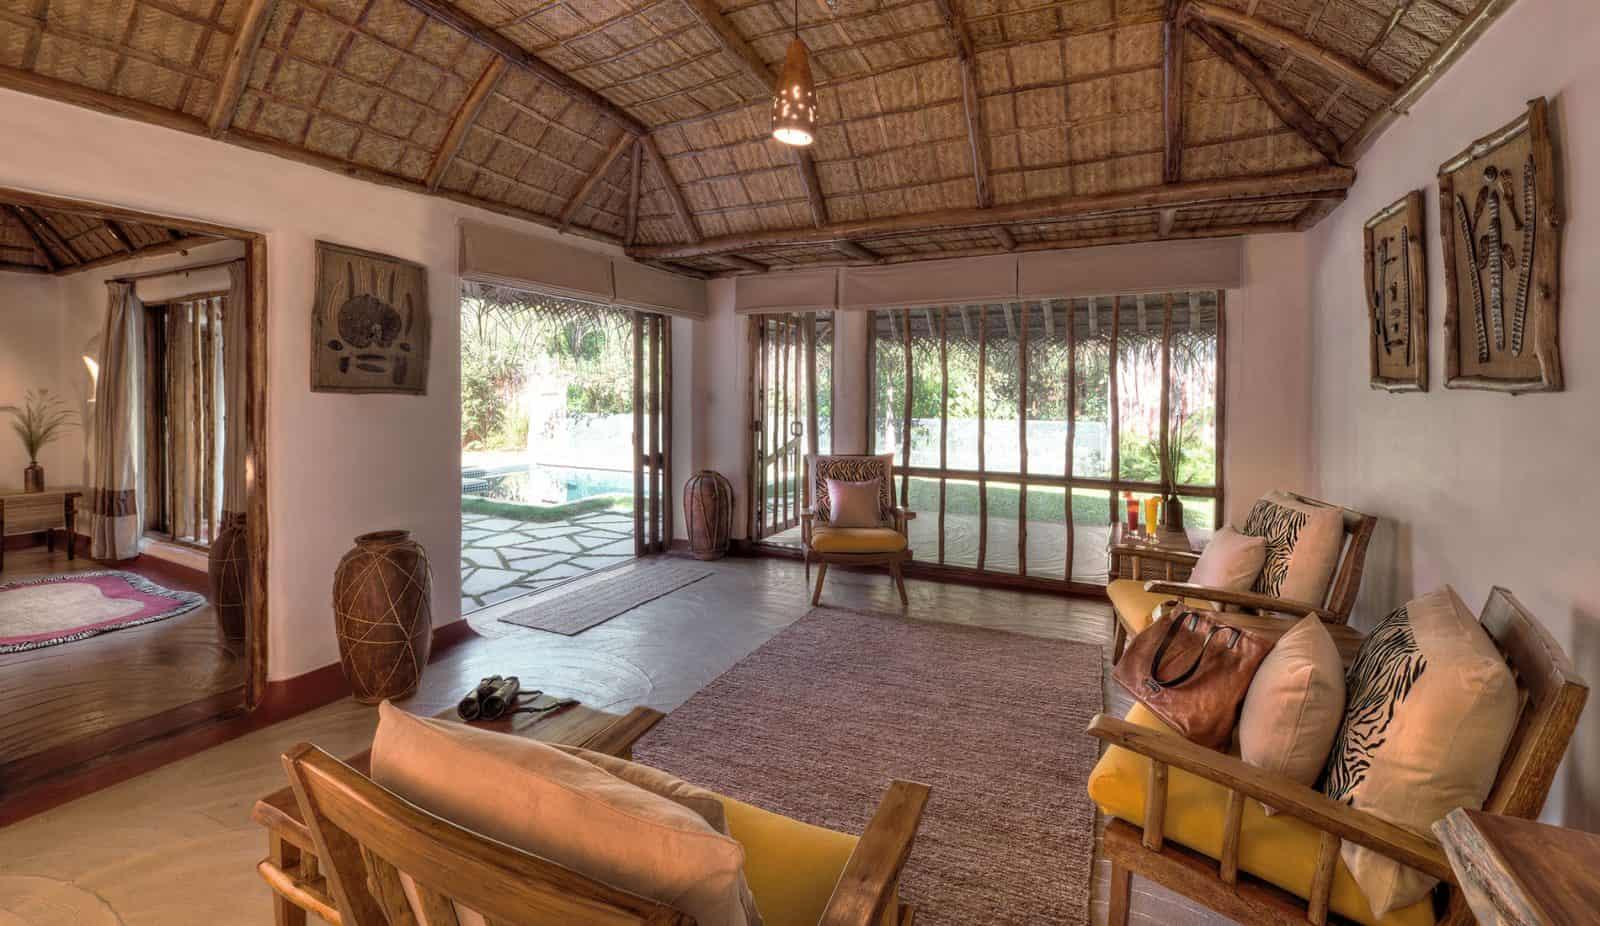 Pool-hut-H_Living-Room-1-1600x926